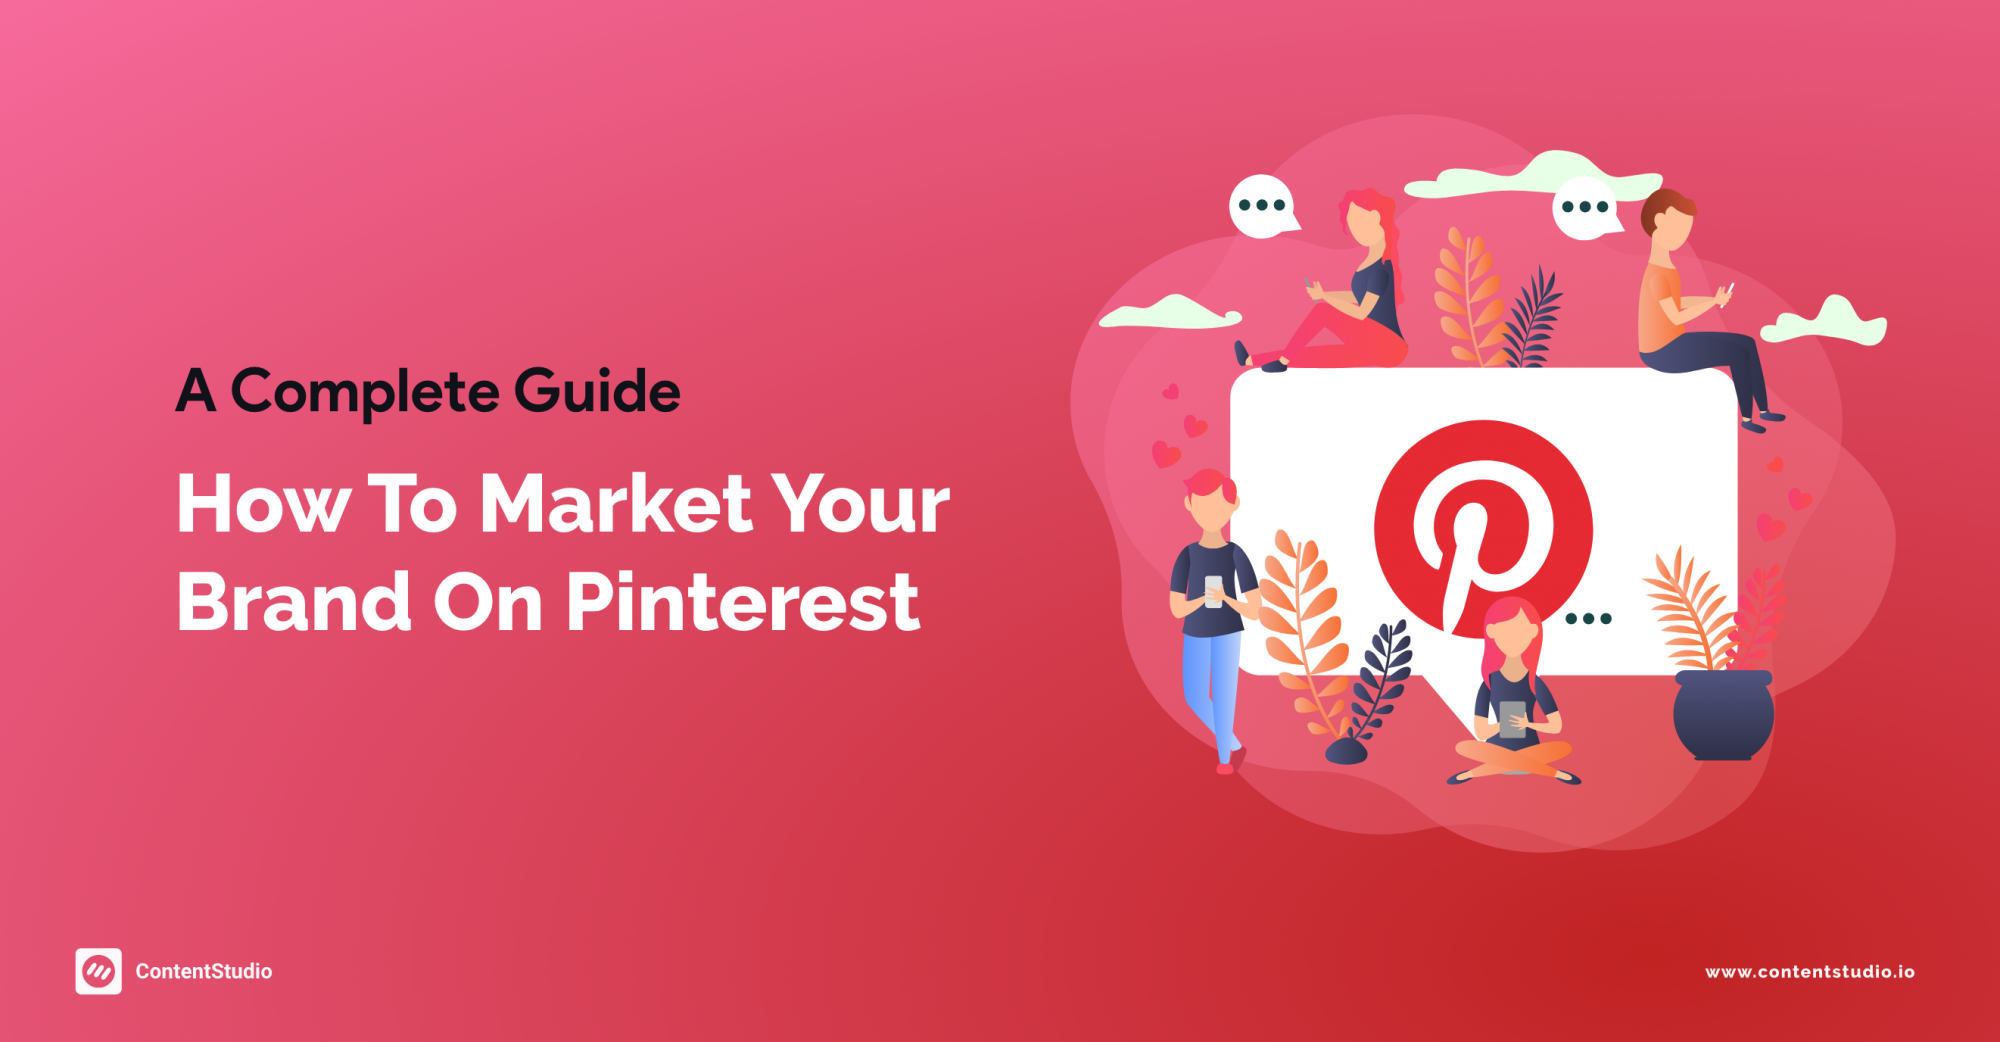 market your brand on Pinterest